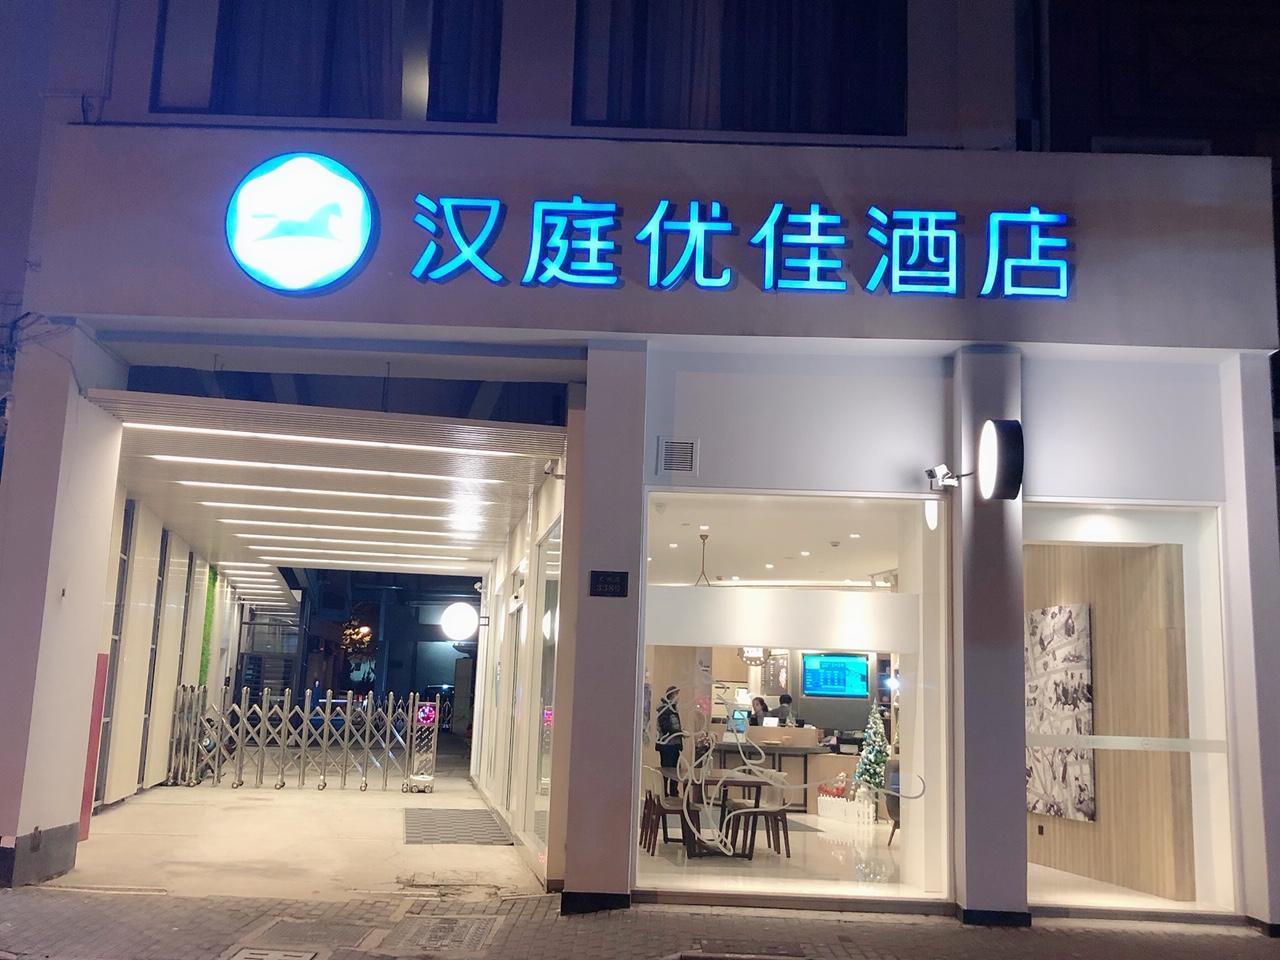 Hanting Premium Hotel Shanghai Xizang South Road Branch Two